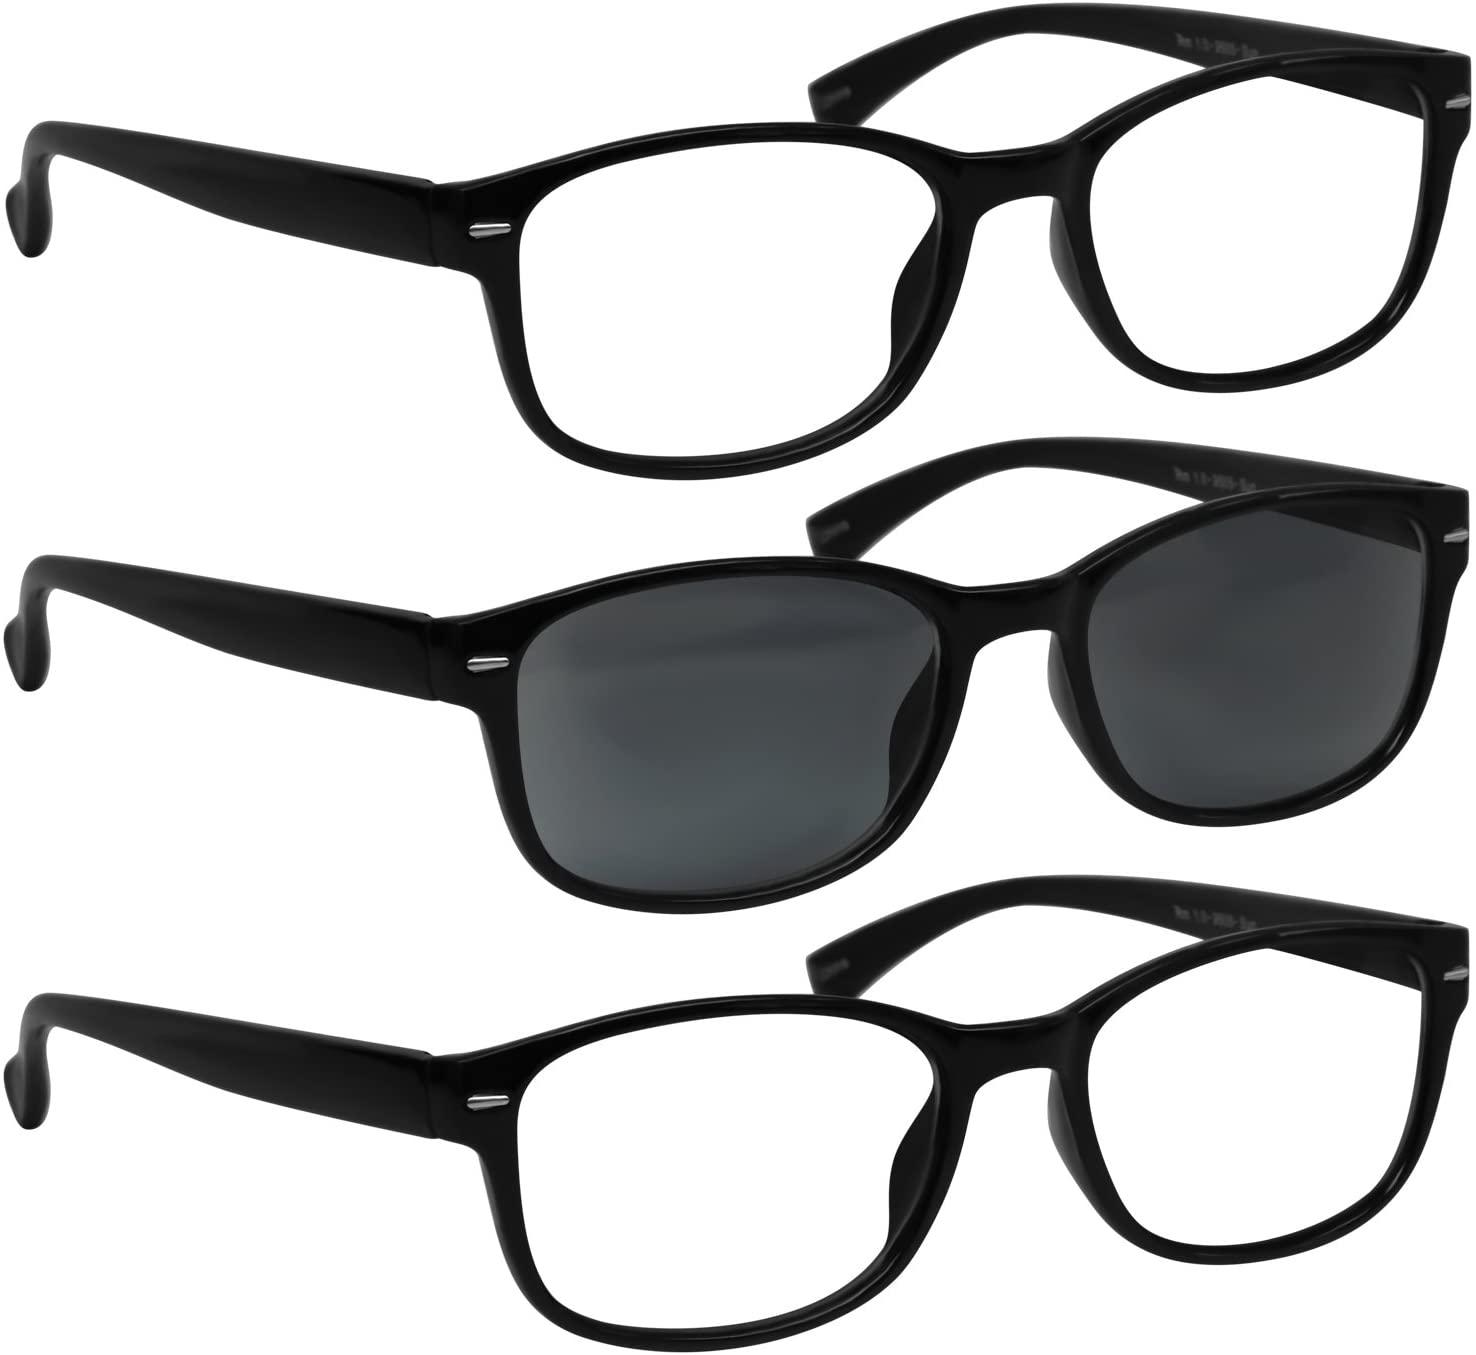 Reading Glasses - HP9505 - VP3-2 Black and 1 Sun Black -4.00